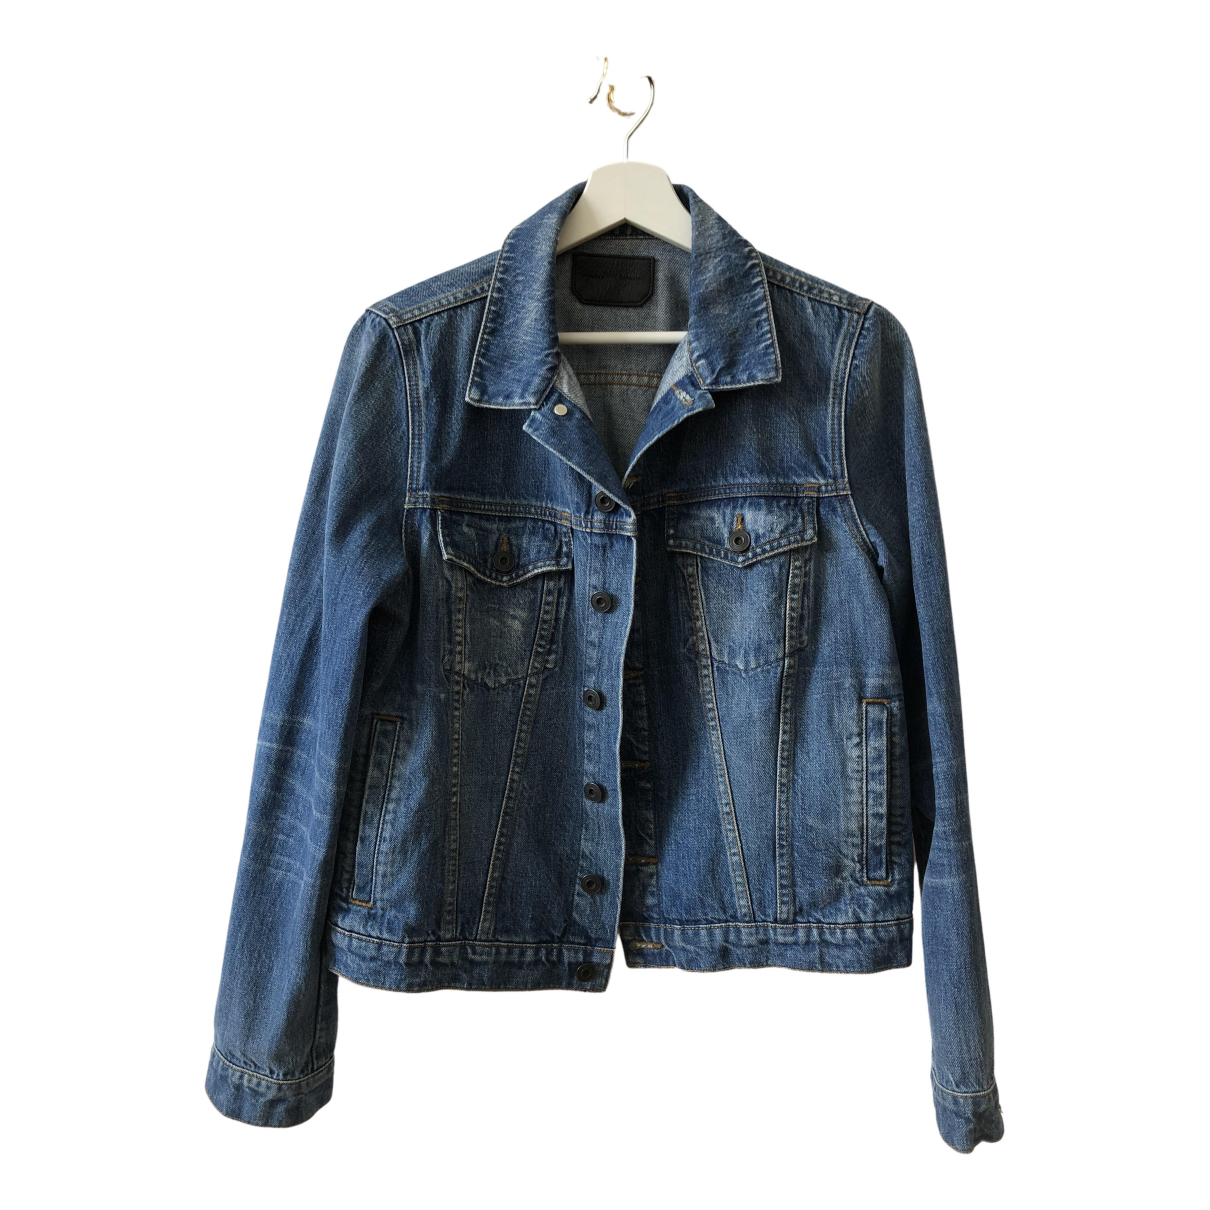 Proenza Schouler \N Jacke in  Blau Denim - Jeans